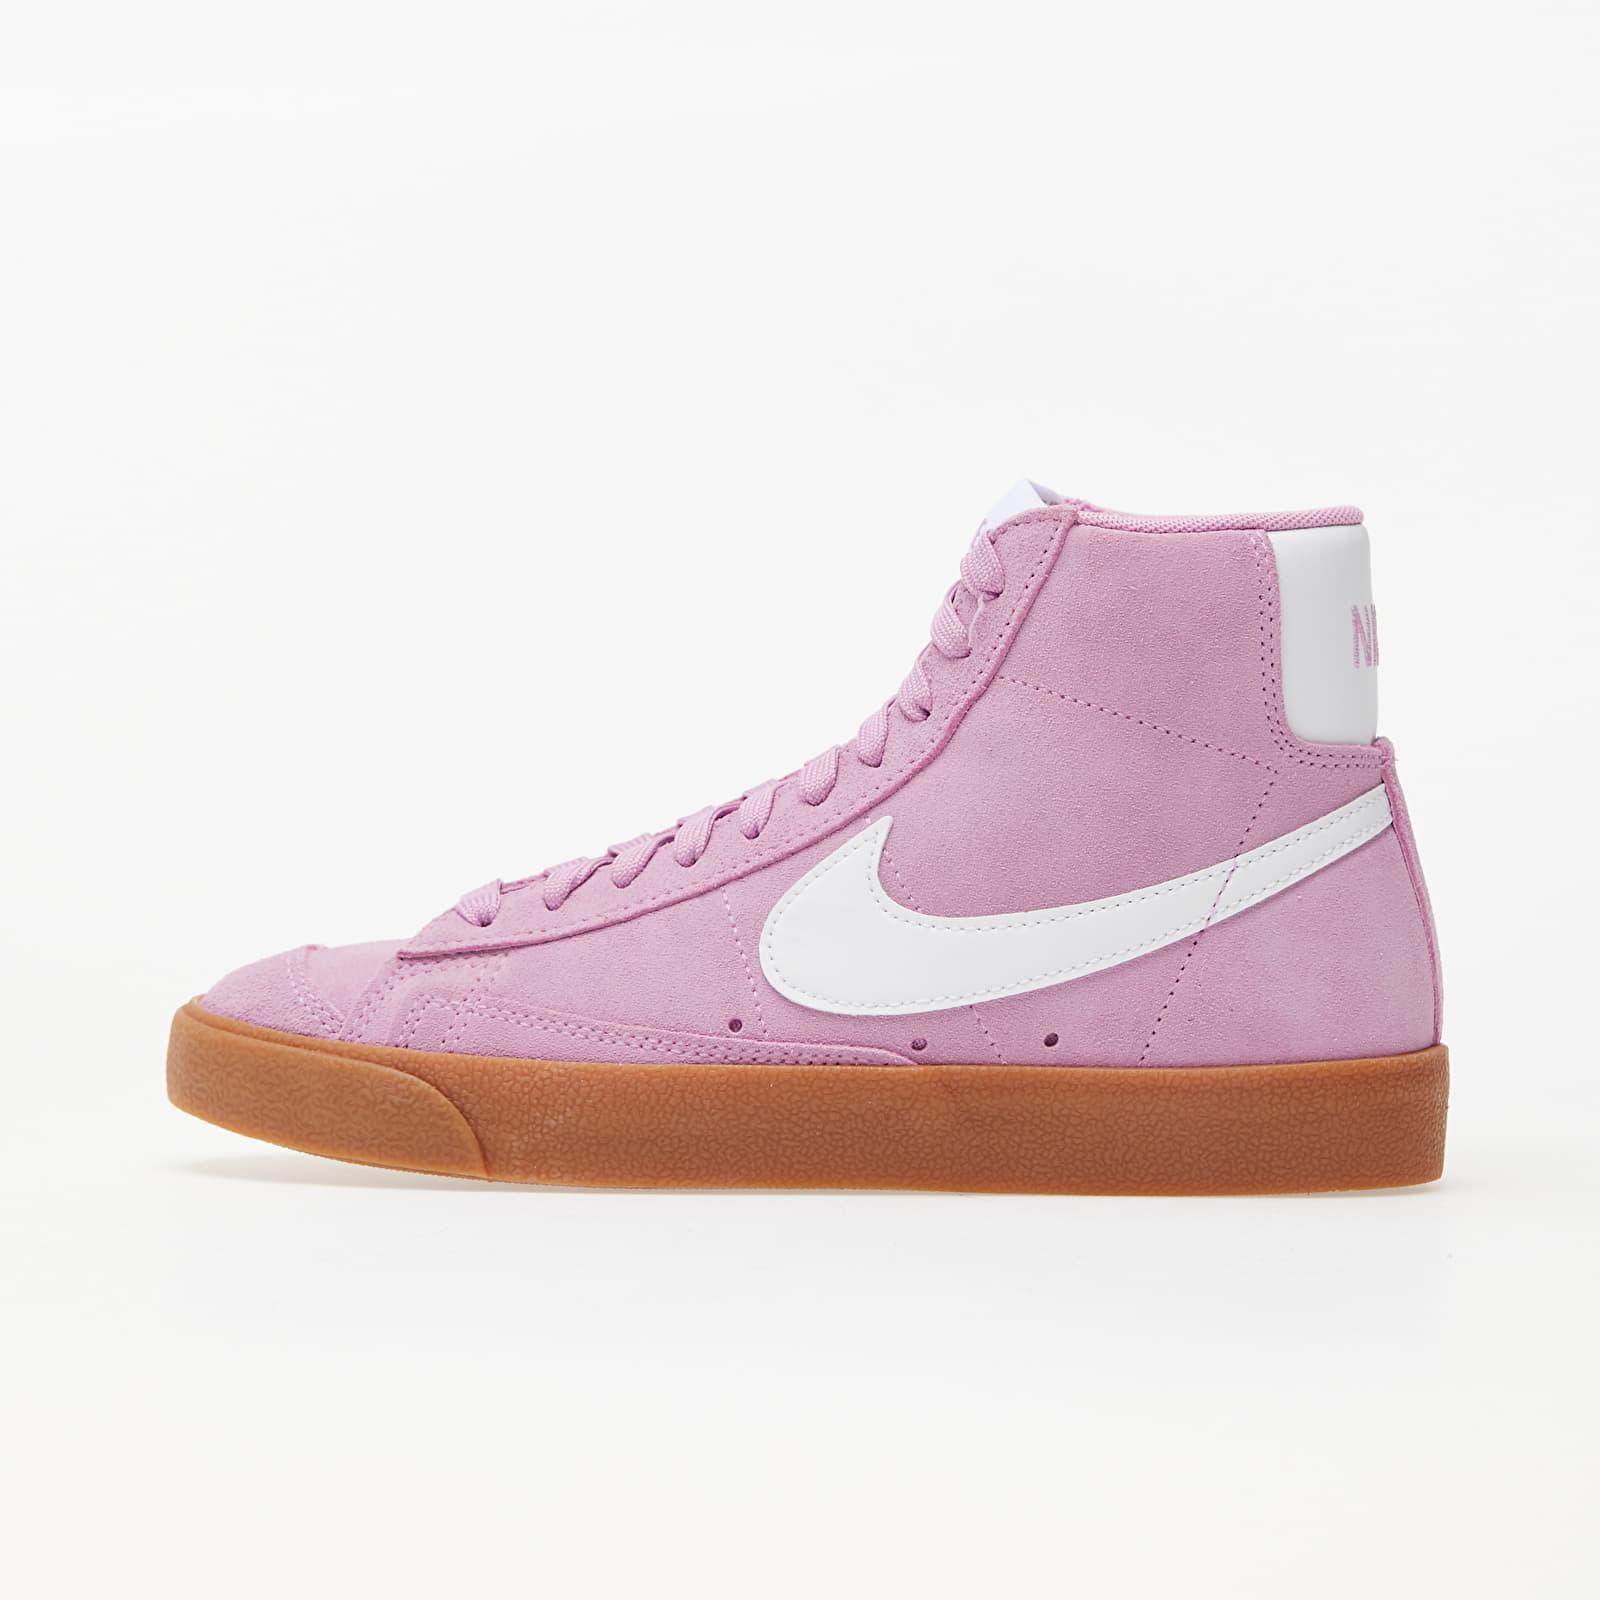 Nike W Blazer Mid '77 Suede Beyond Pink/ White-Gum Med Brown EUR 38.5